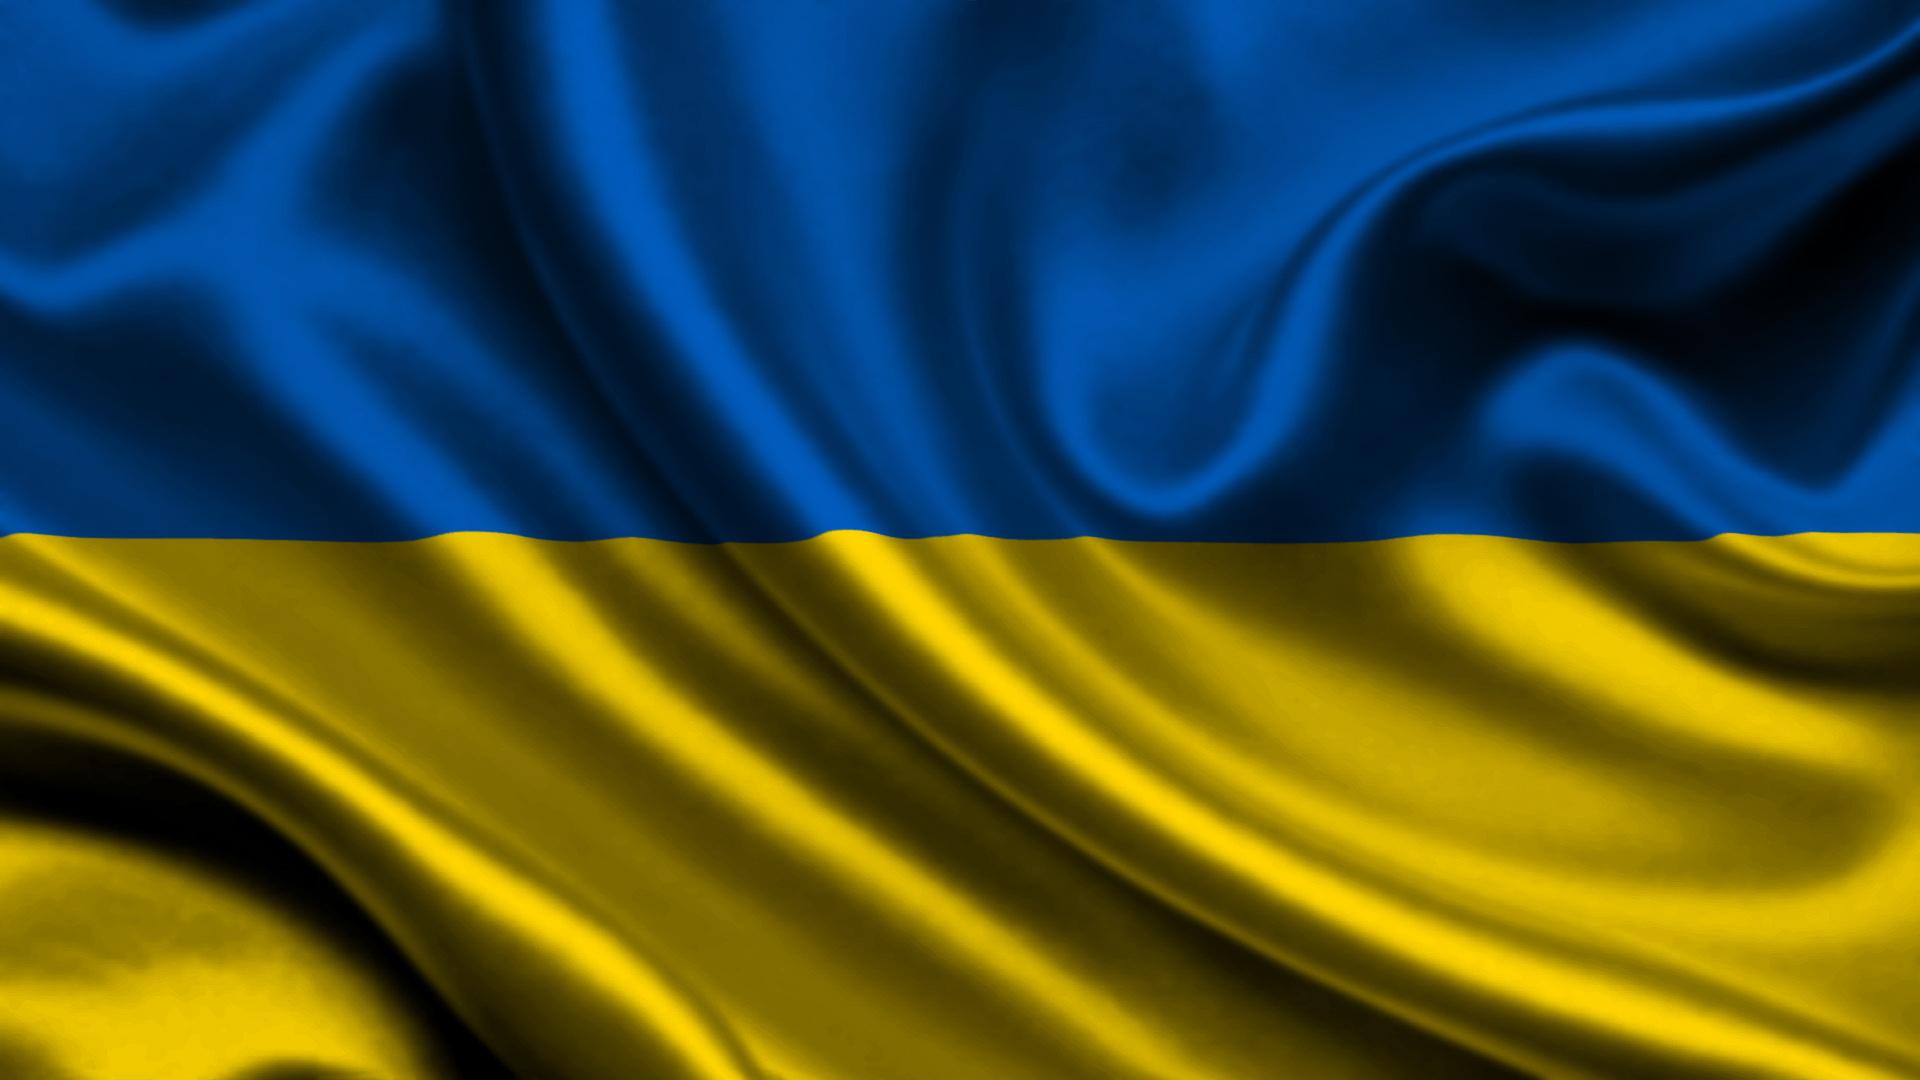 как картинка прапора украины машина